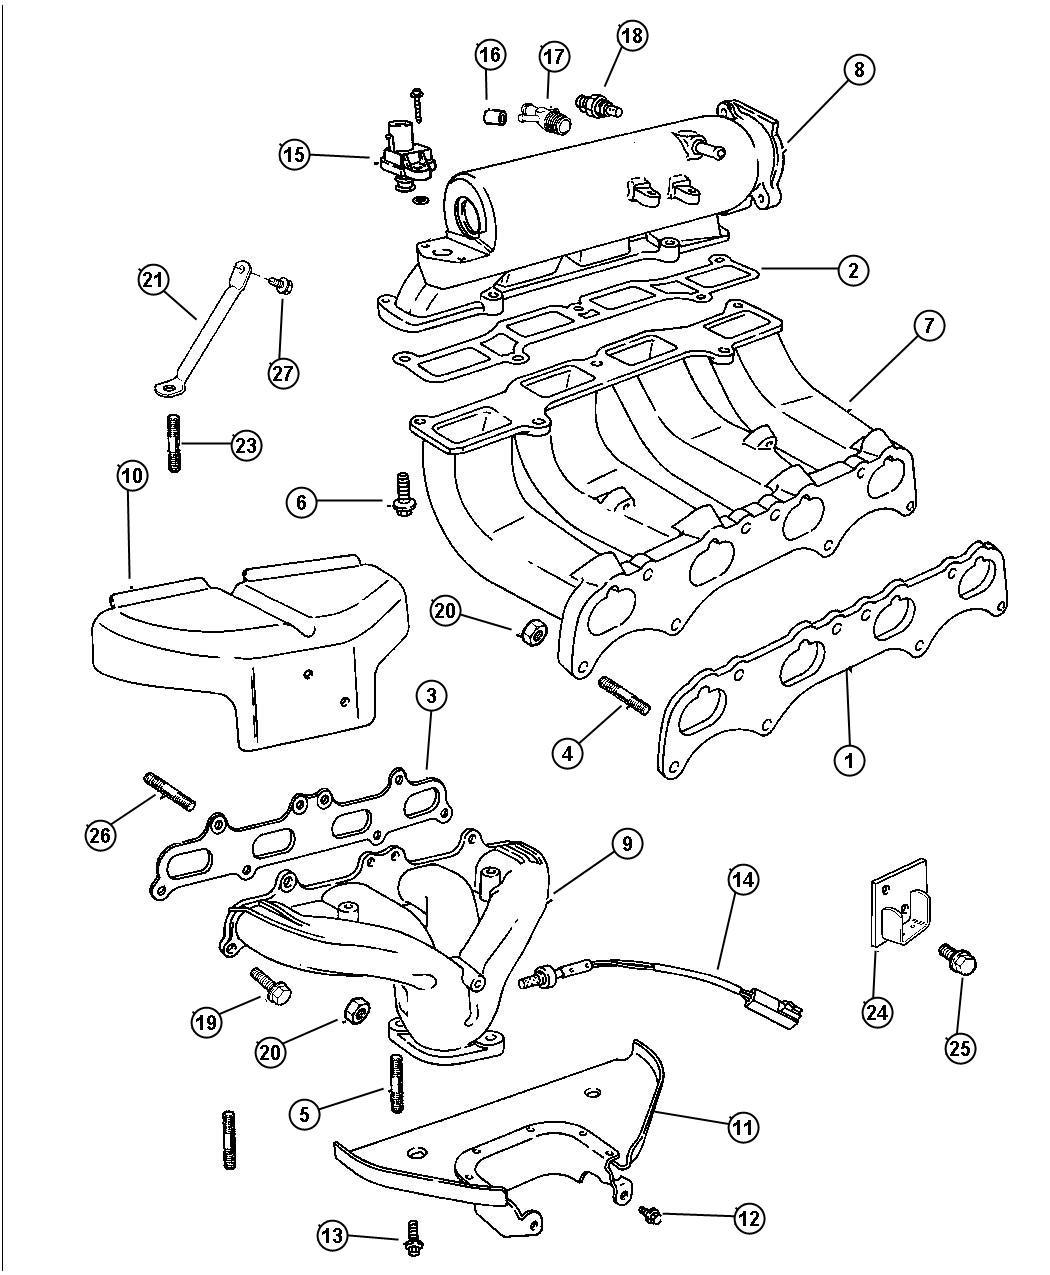 dodge avenger manifold  intake  intake lower to head  exhaust  engine  manifolds